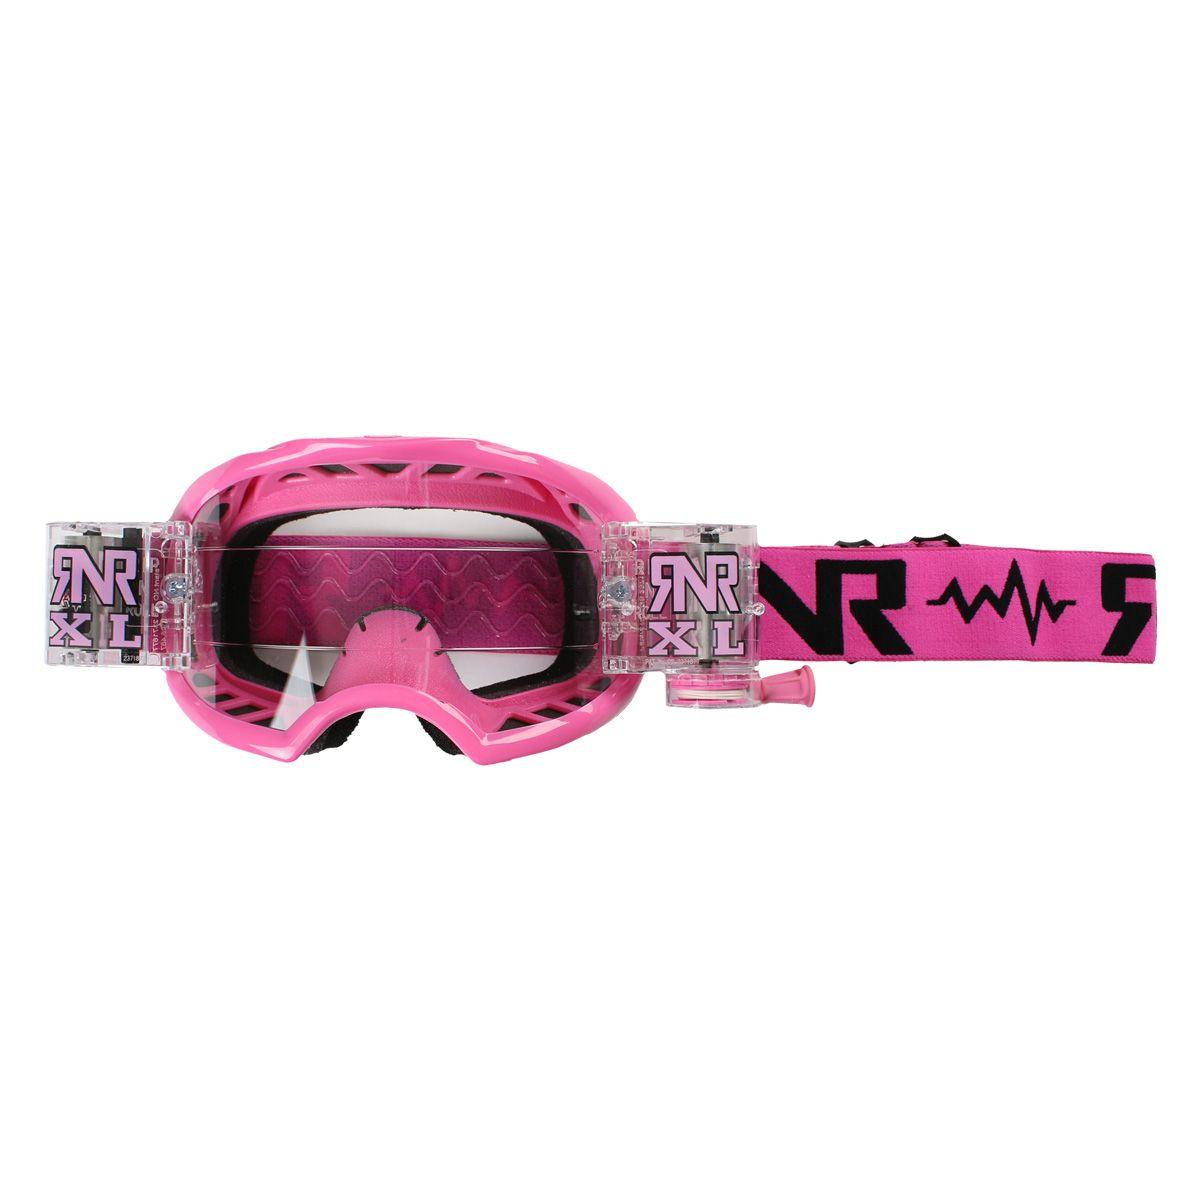 Rip 'n Roll Crossbril Colossus Roll-Off XL Pink